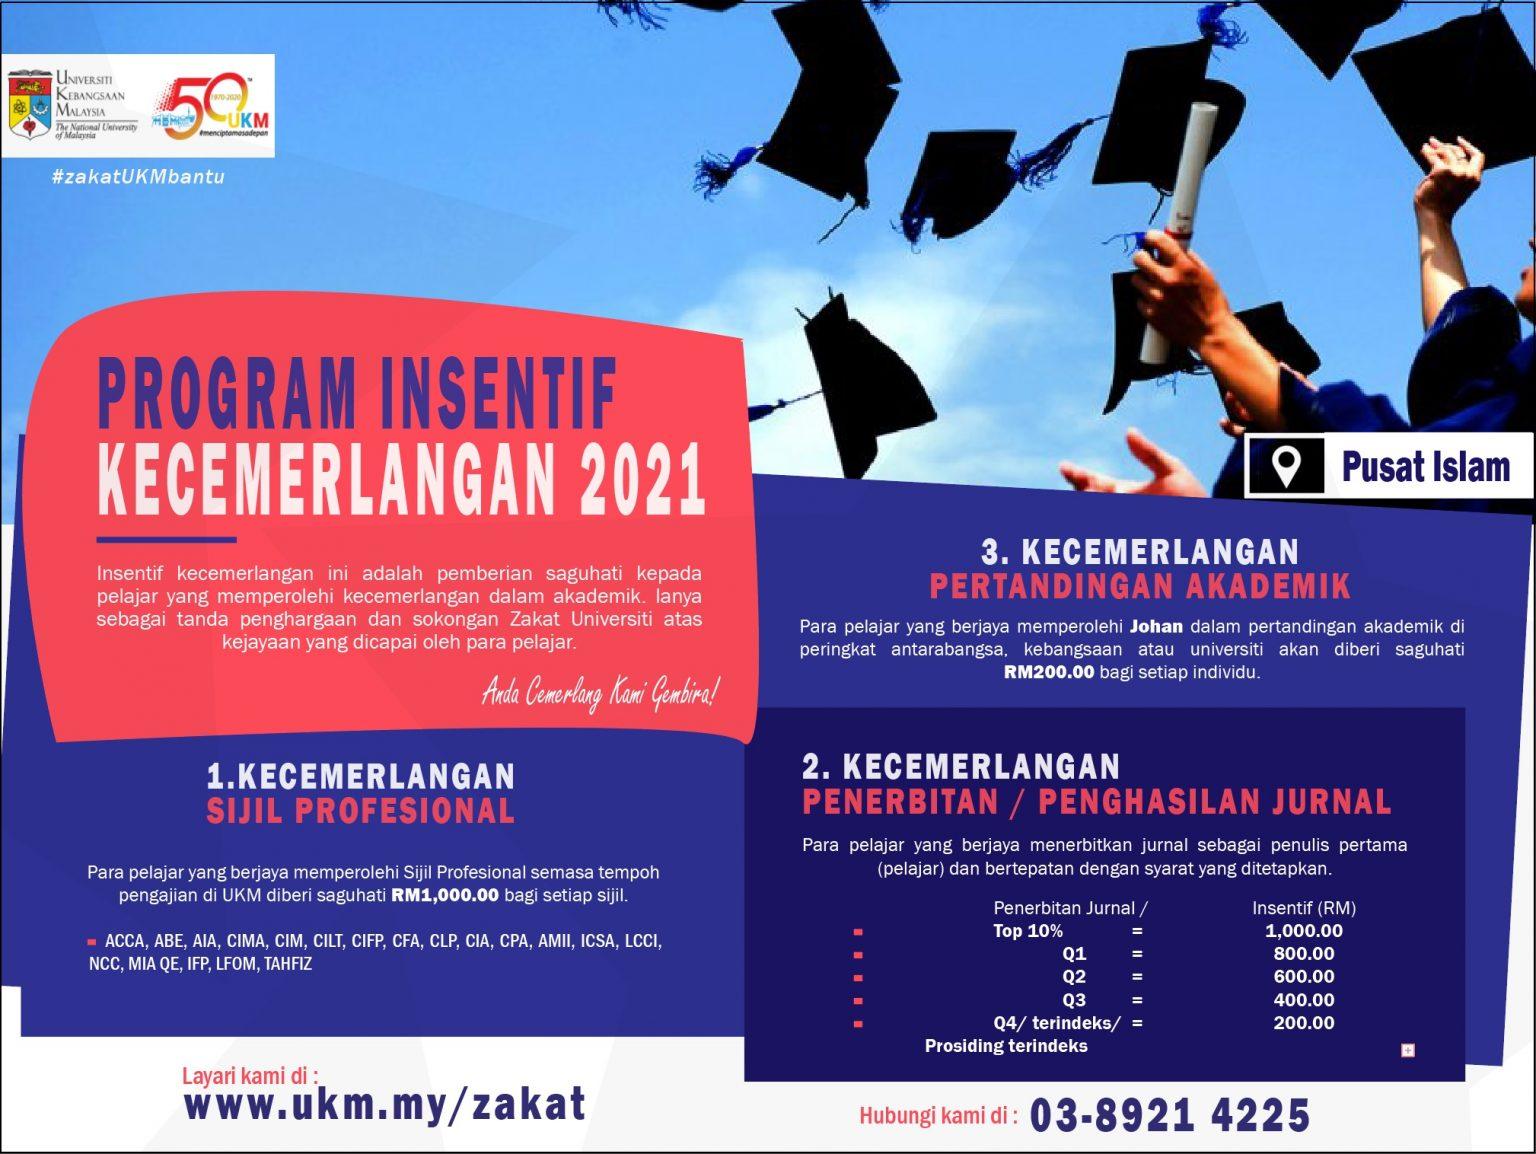 Zakat Universiti